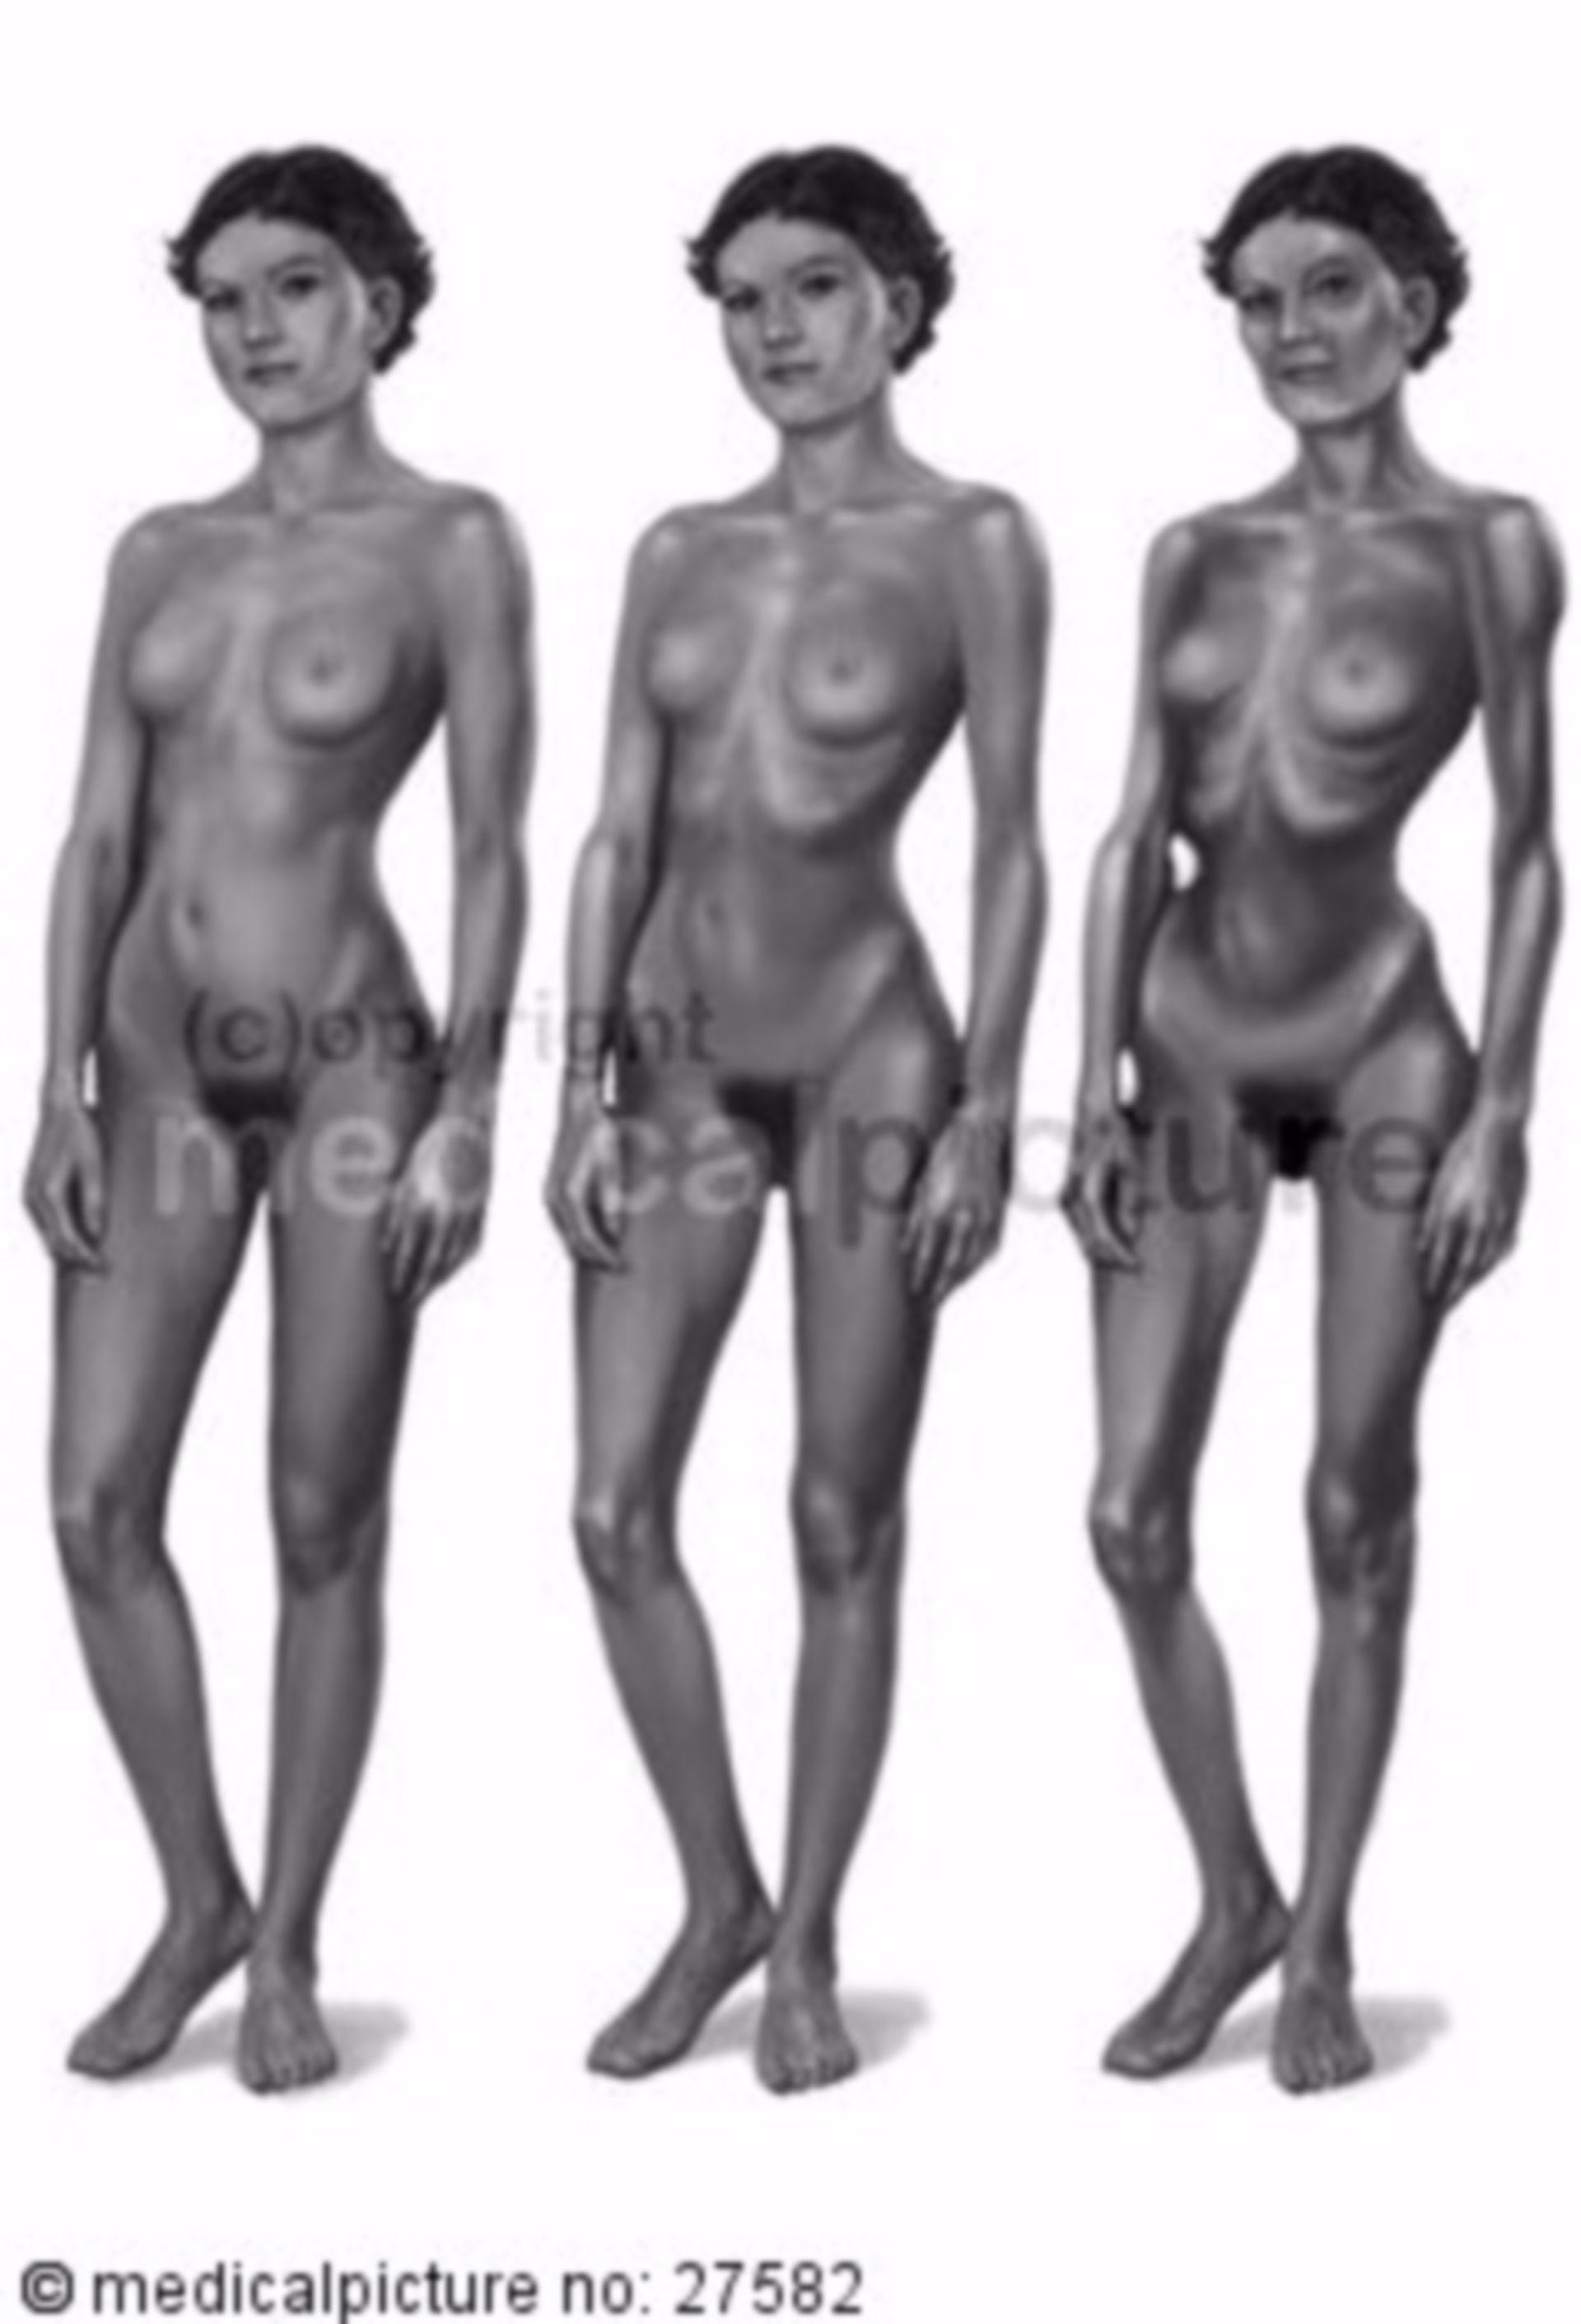 Anorexia, Development